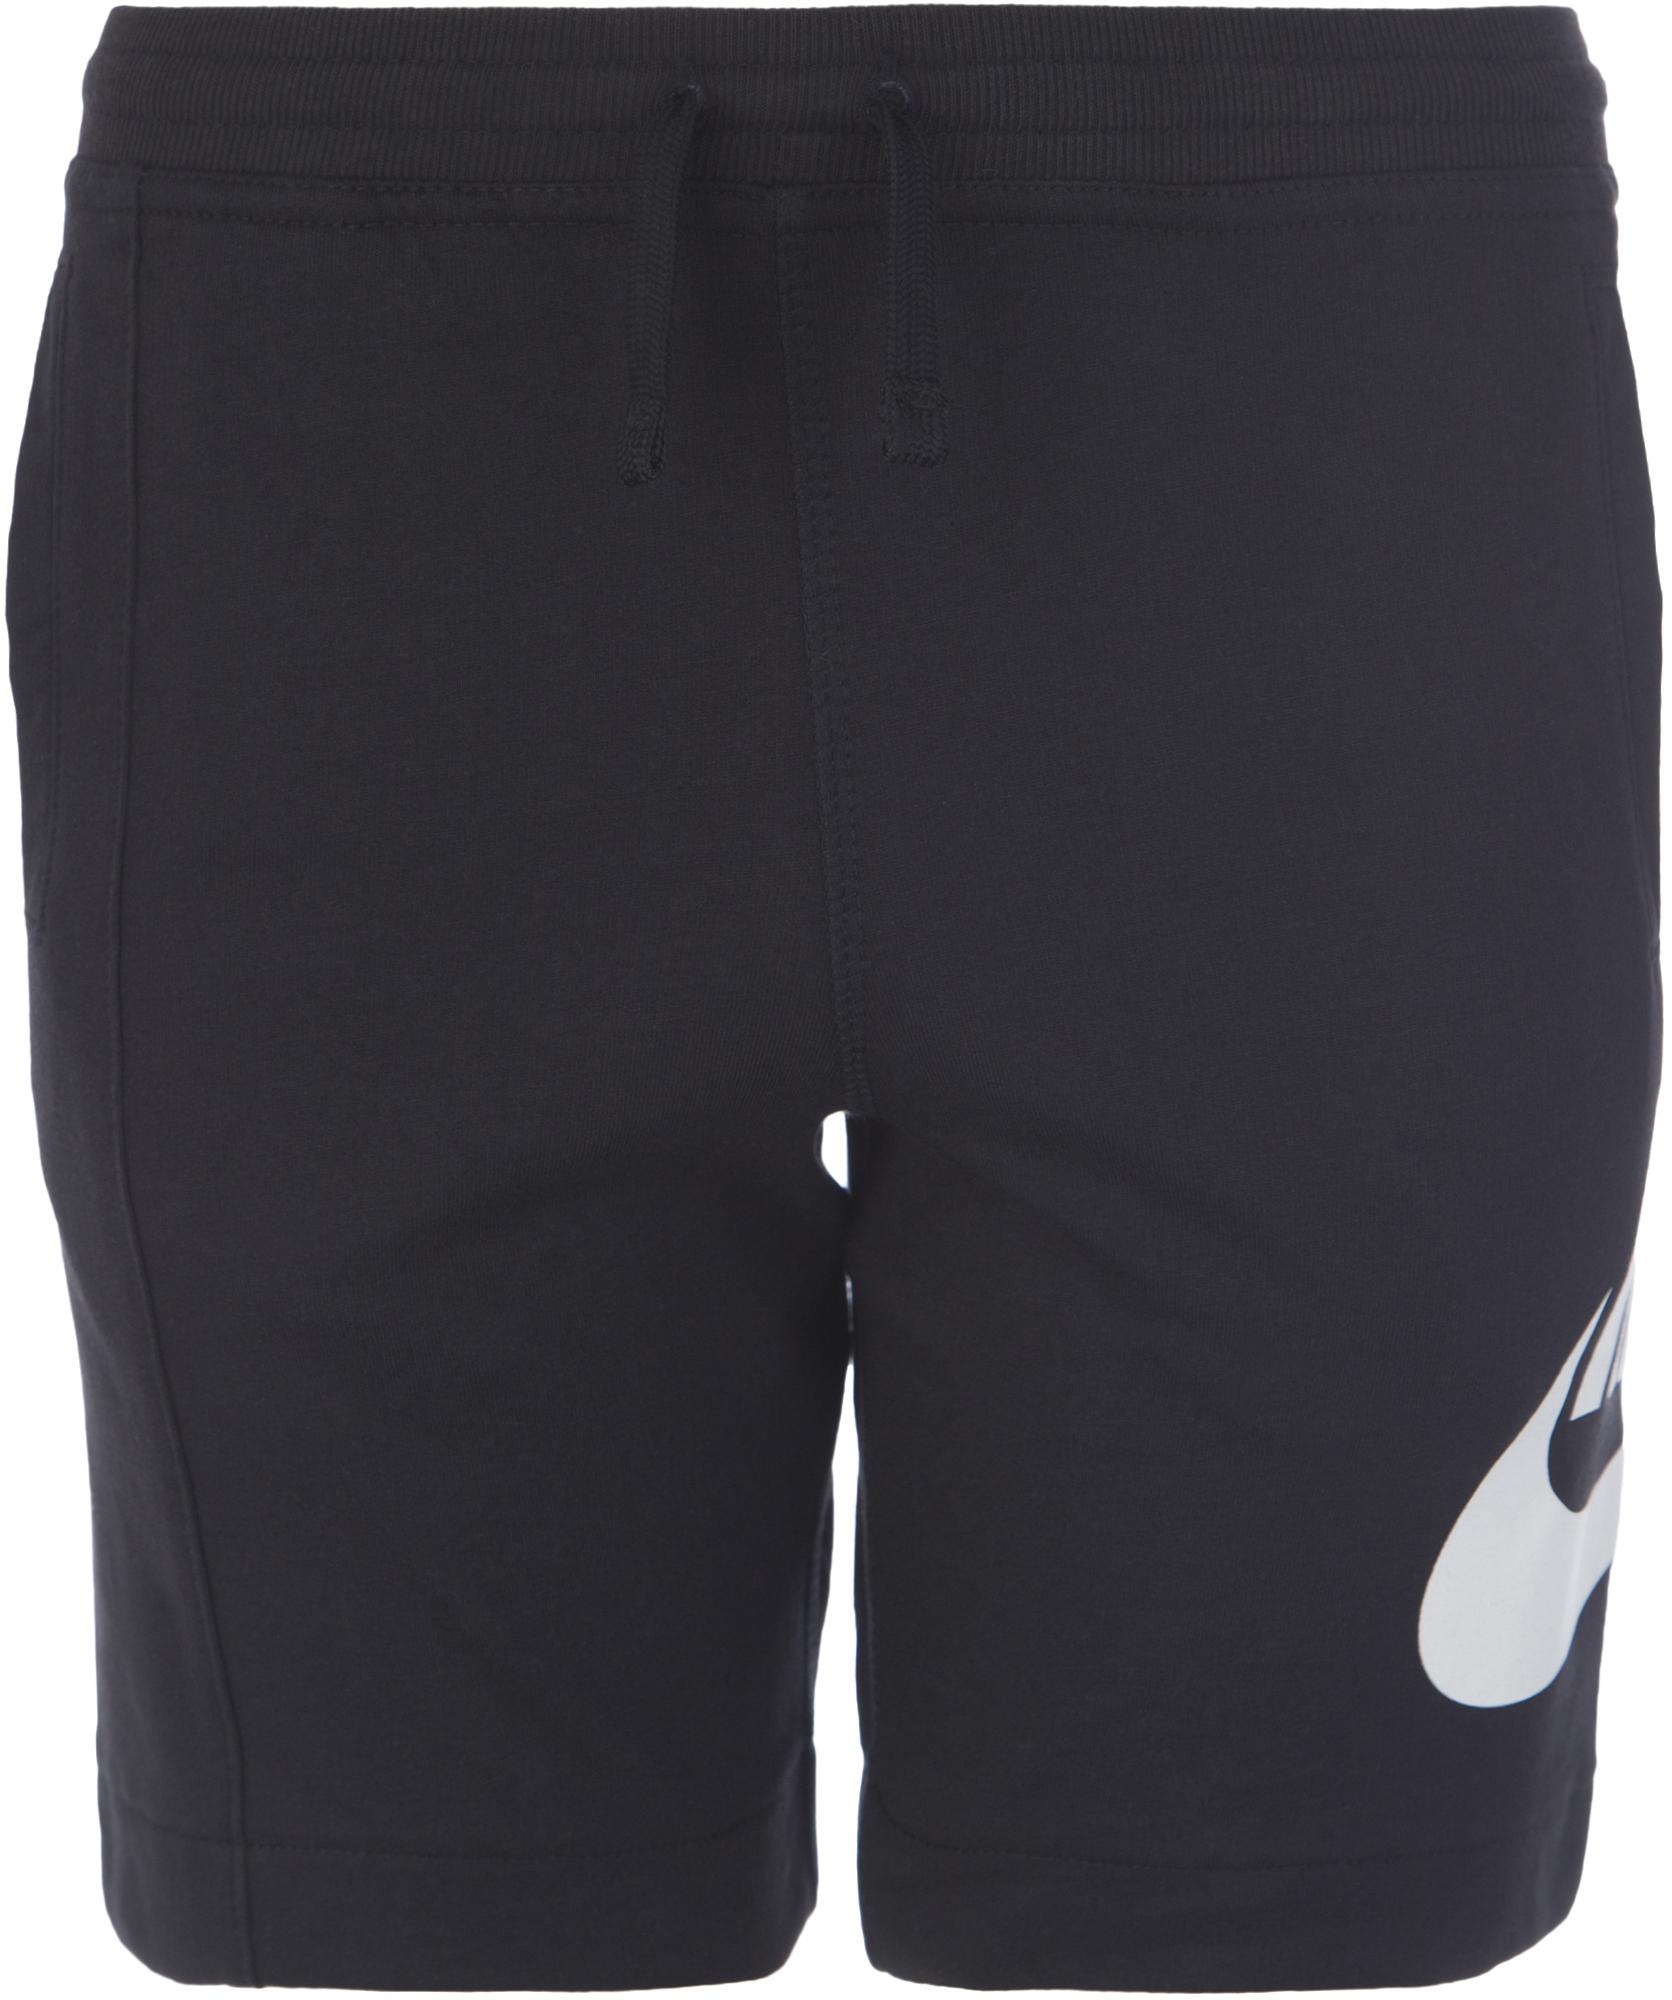 Nike Шорты для мальчиков Nike, размер 122 цены онлайн